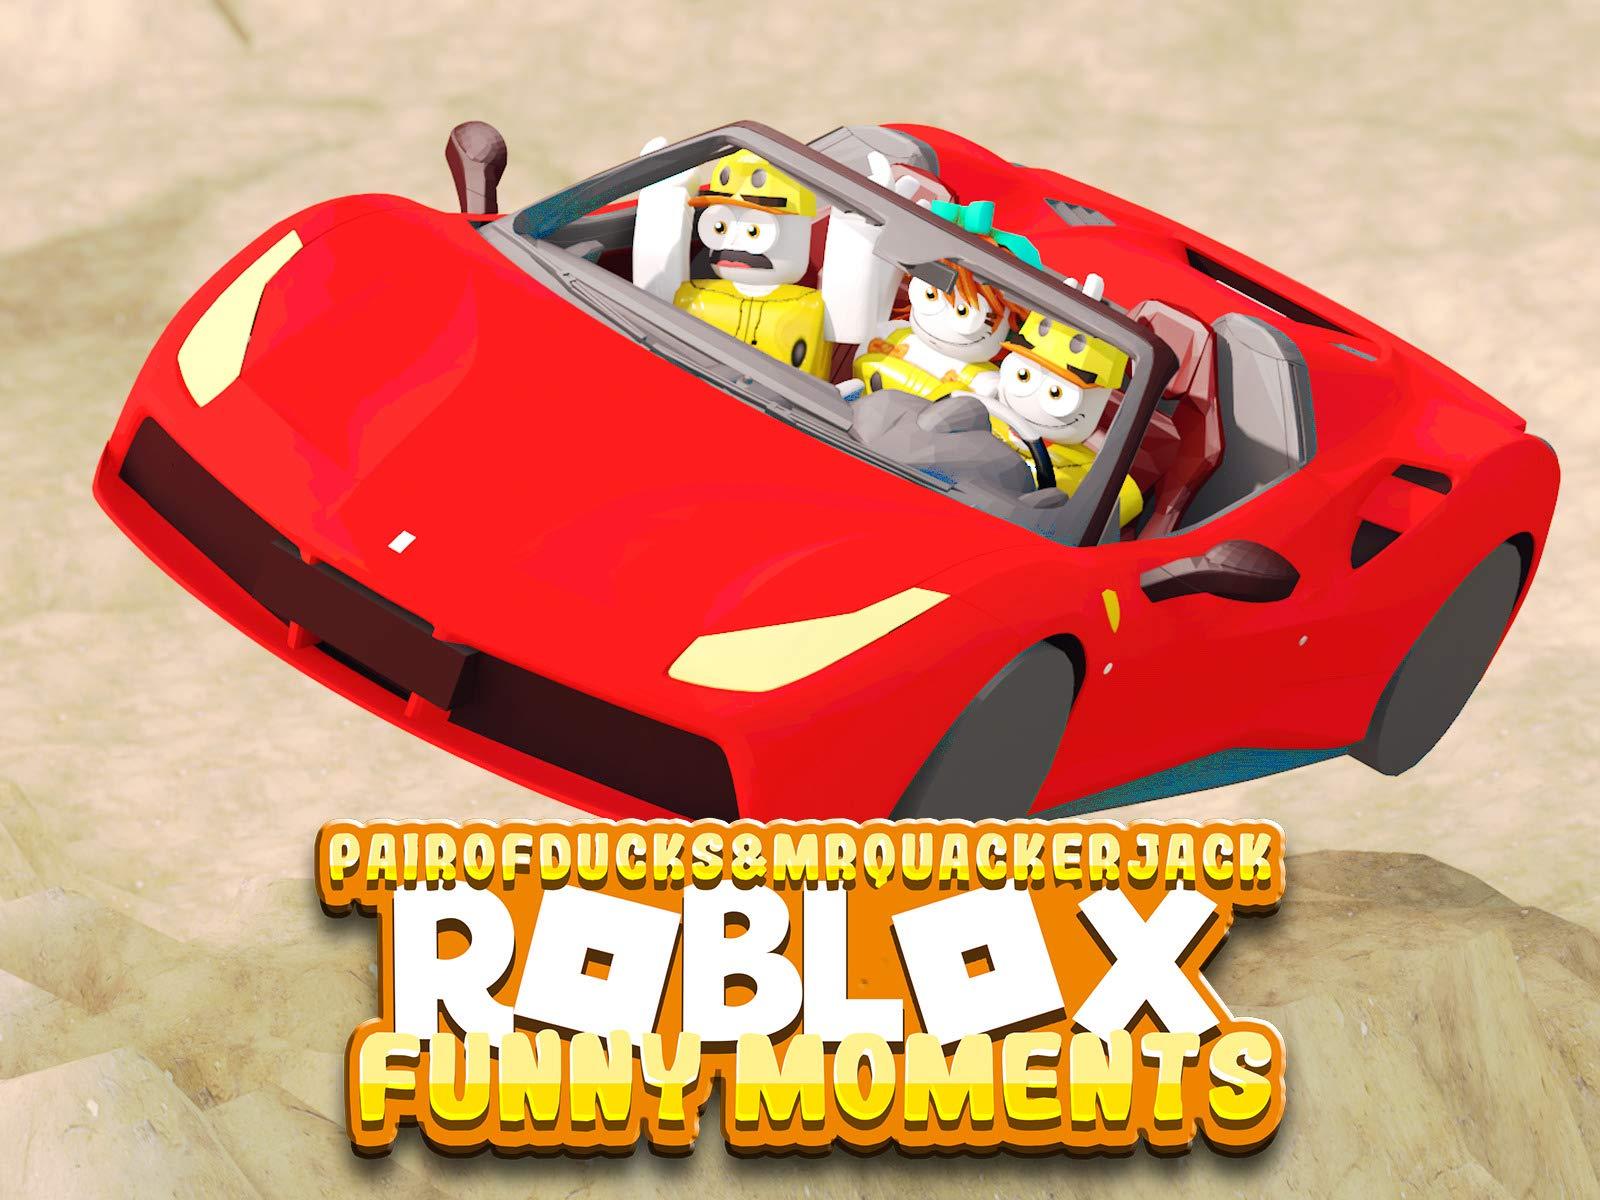 Clip: Roblox Funny Moments (PairofDucks & MrQuackerJack) - Season 13